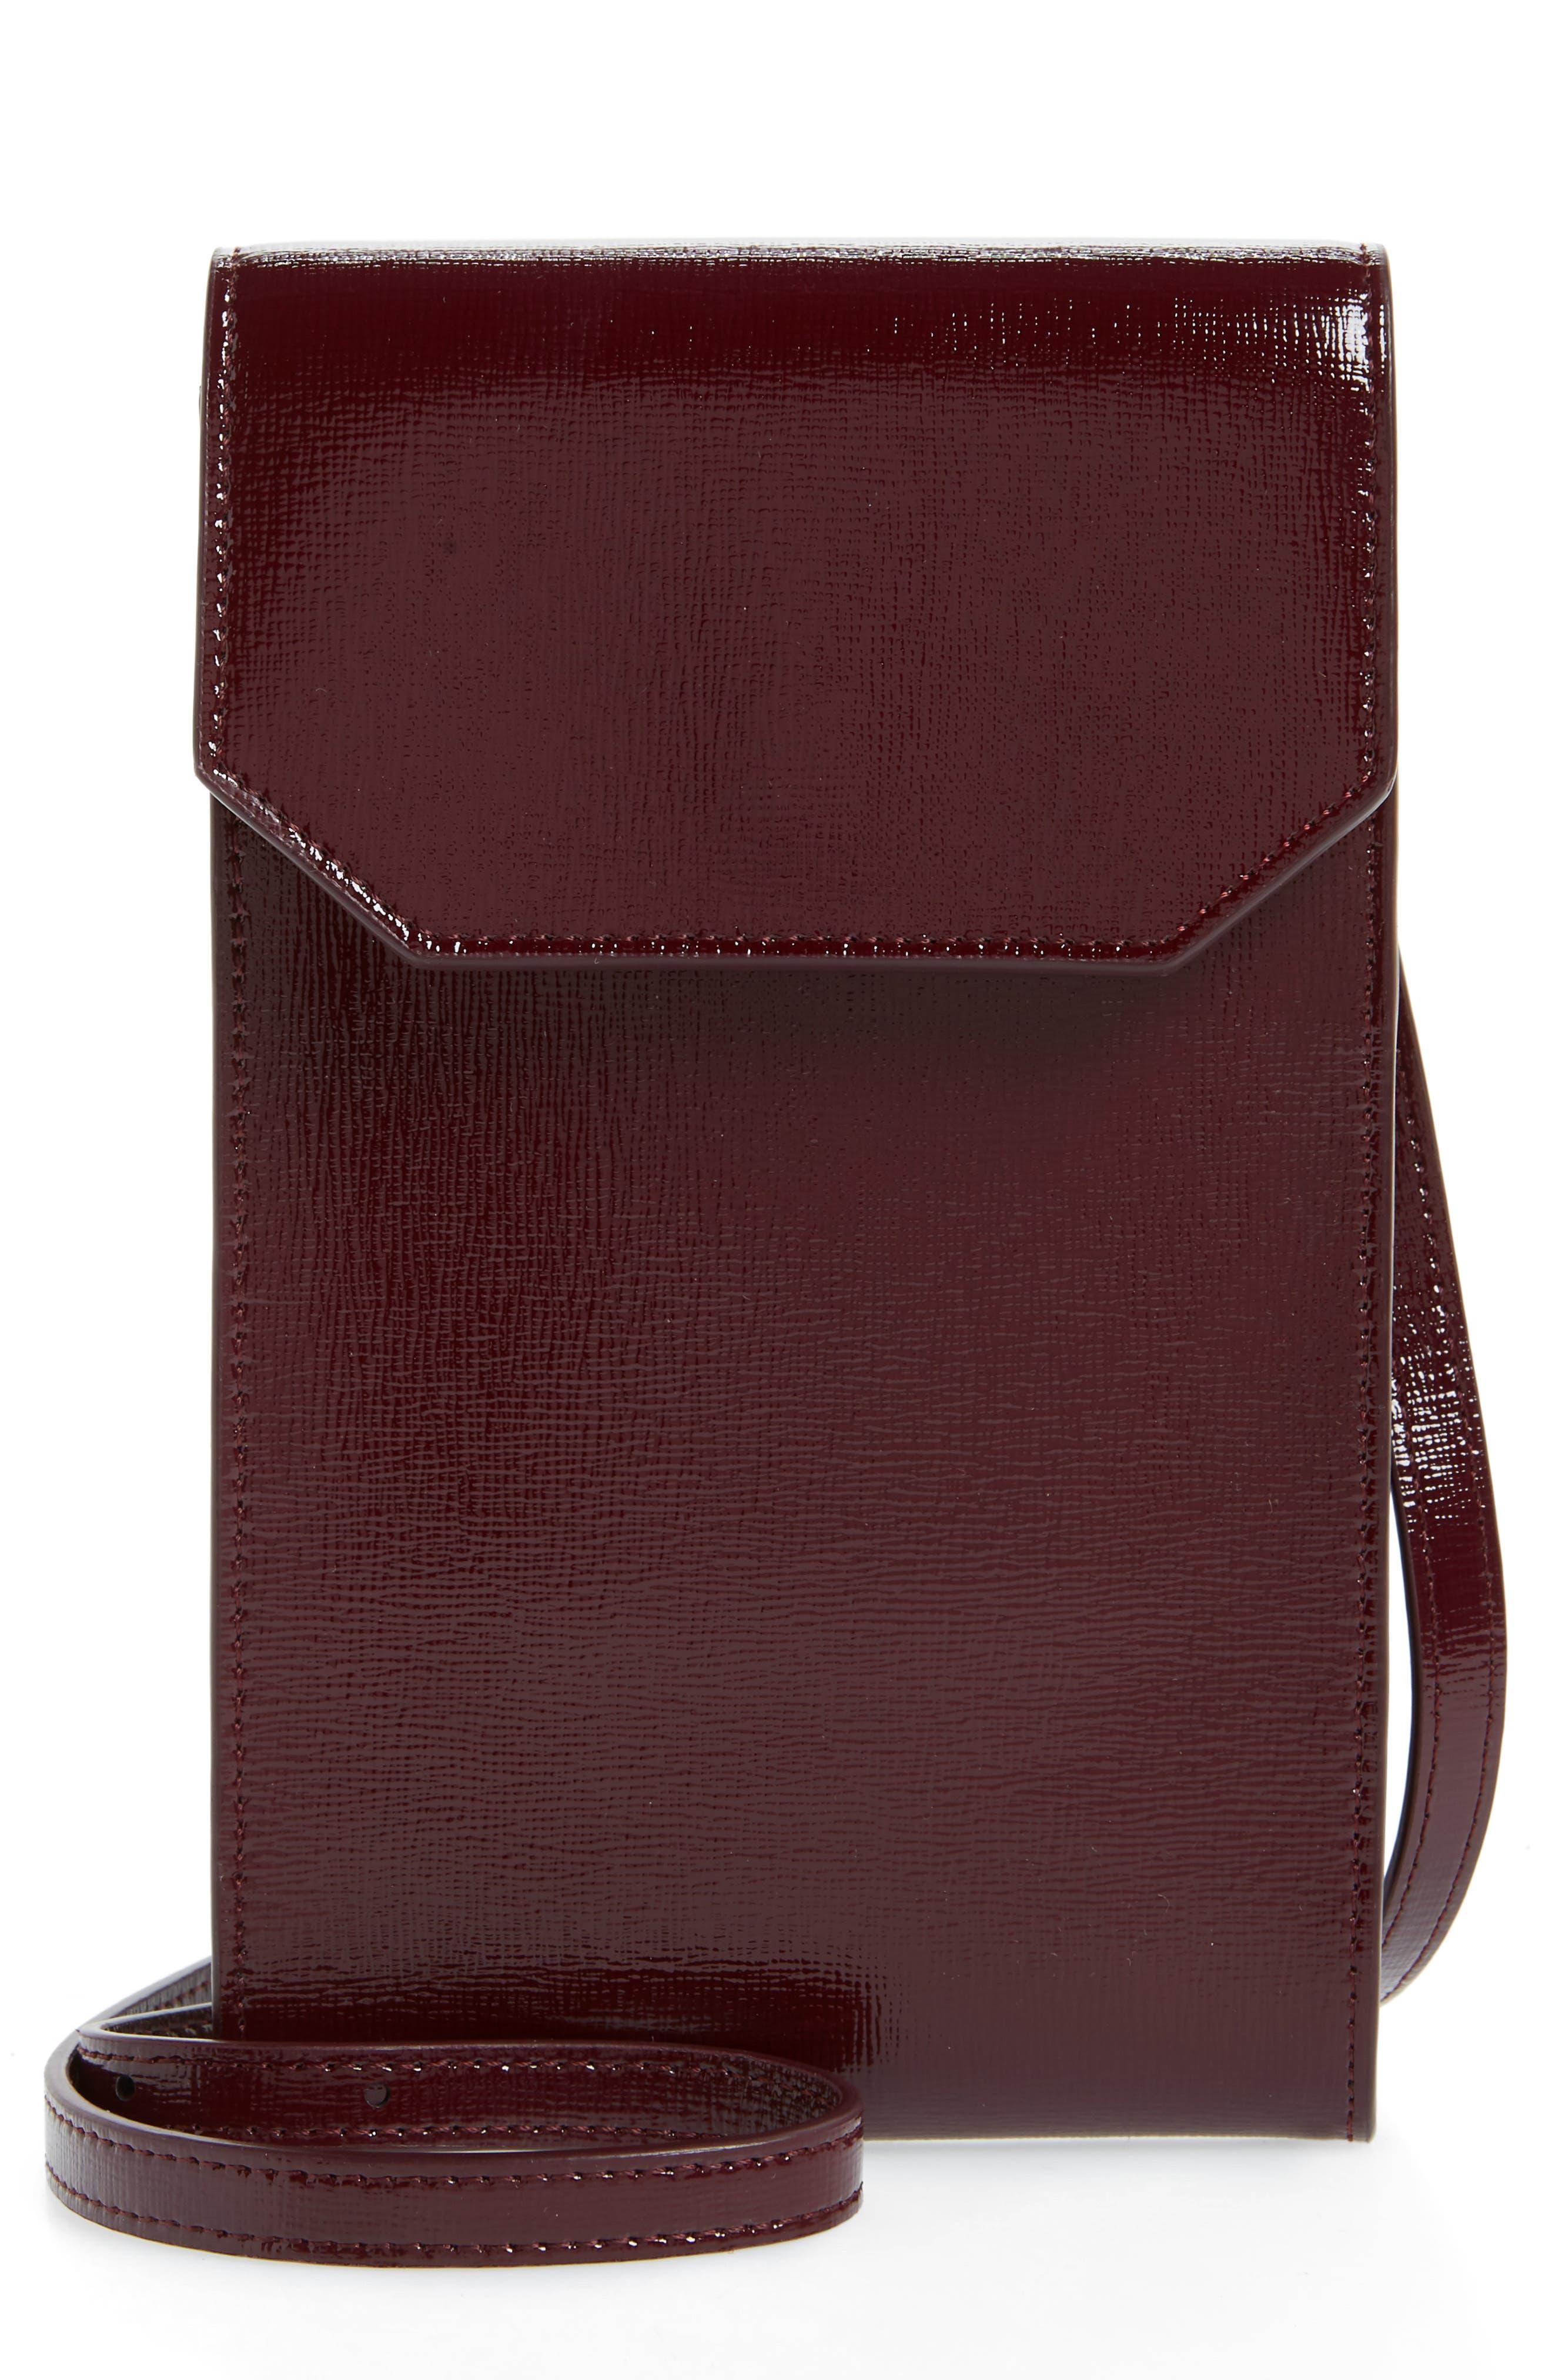 Leather Phone Crossbody Bag,                         Main,                         color, Burgundy Royale